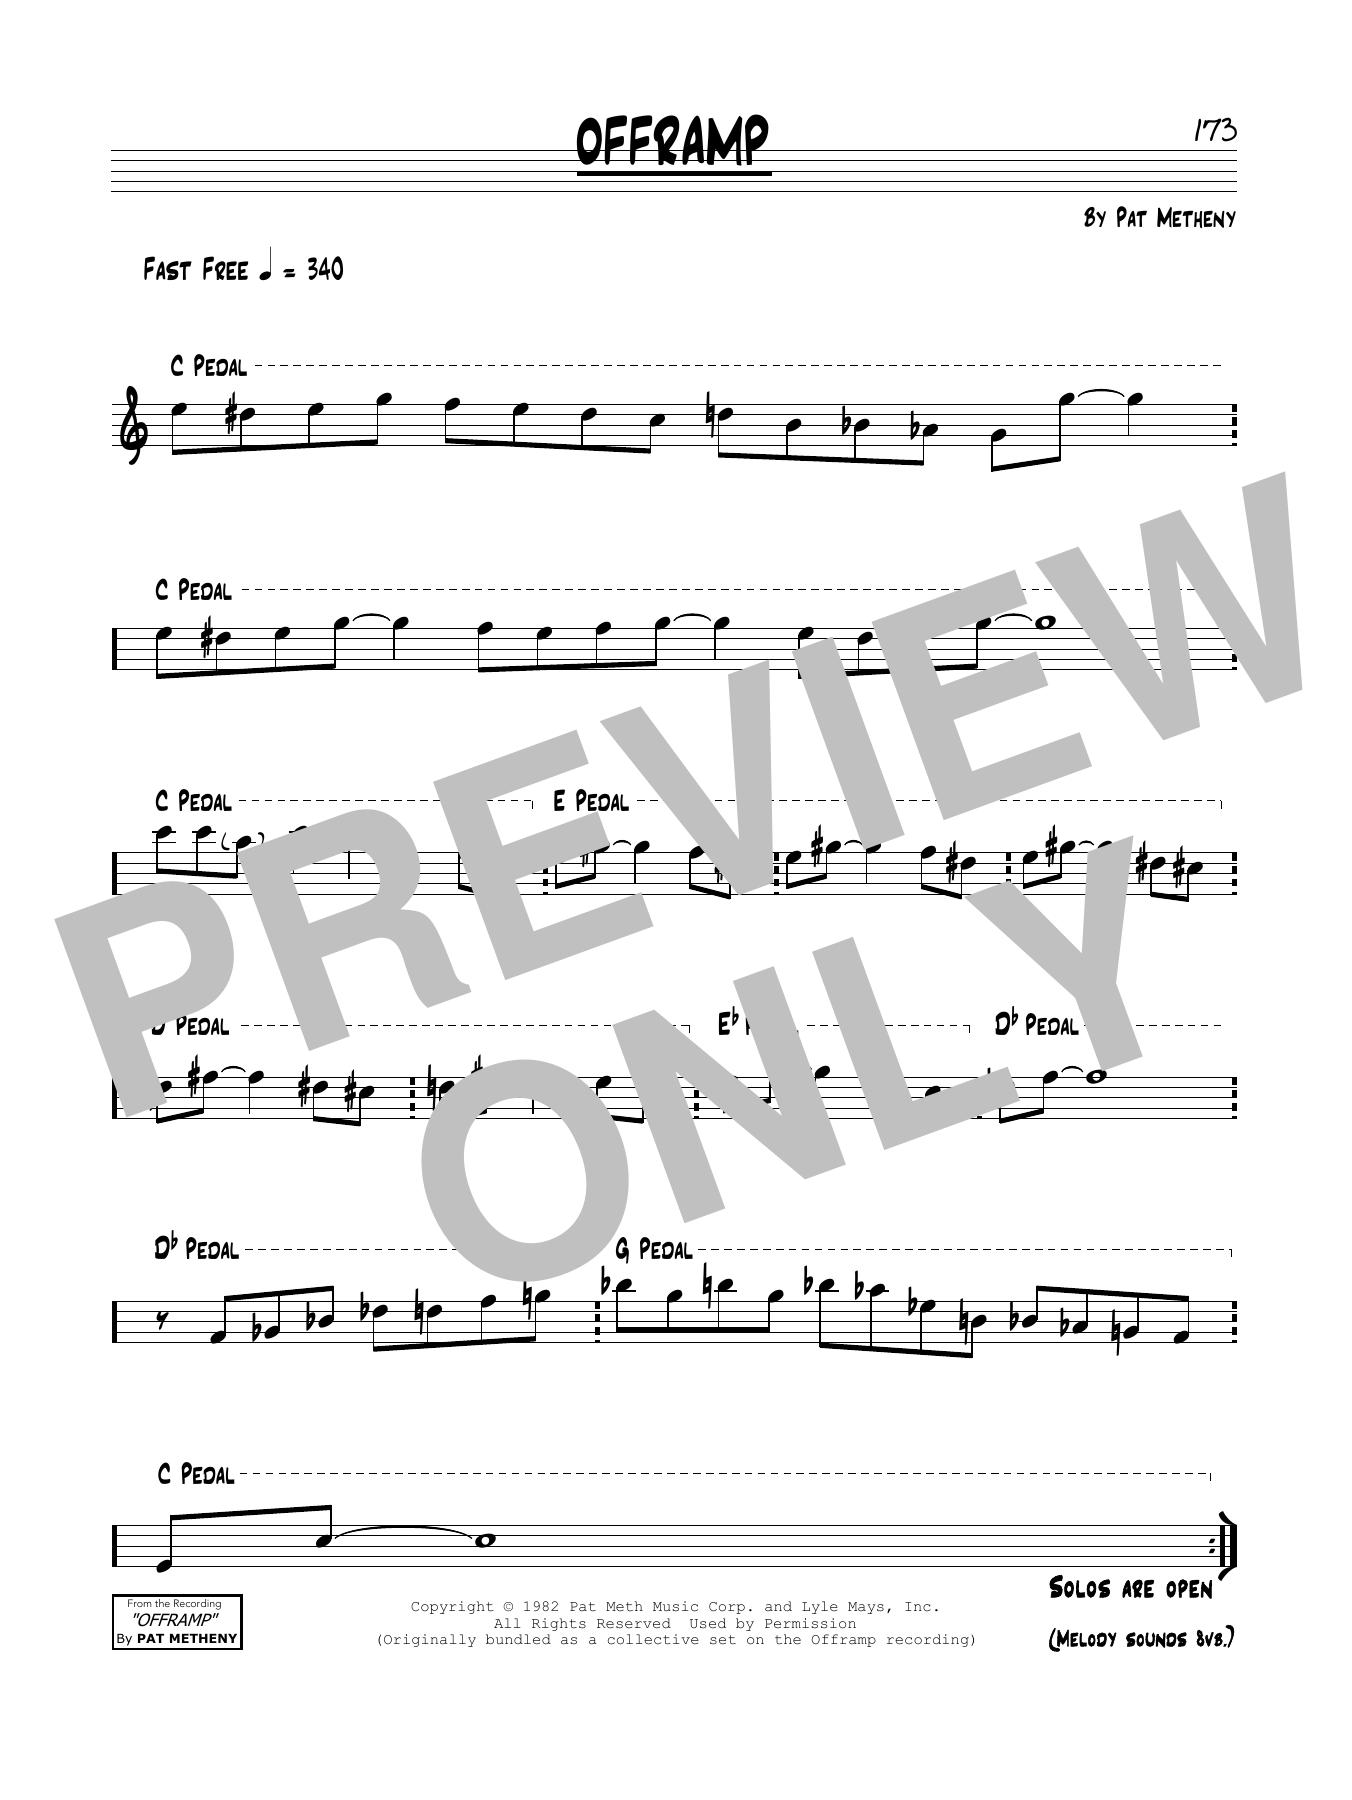 Offramp Sheet Music